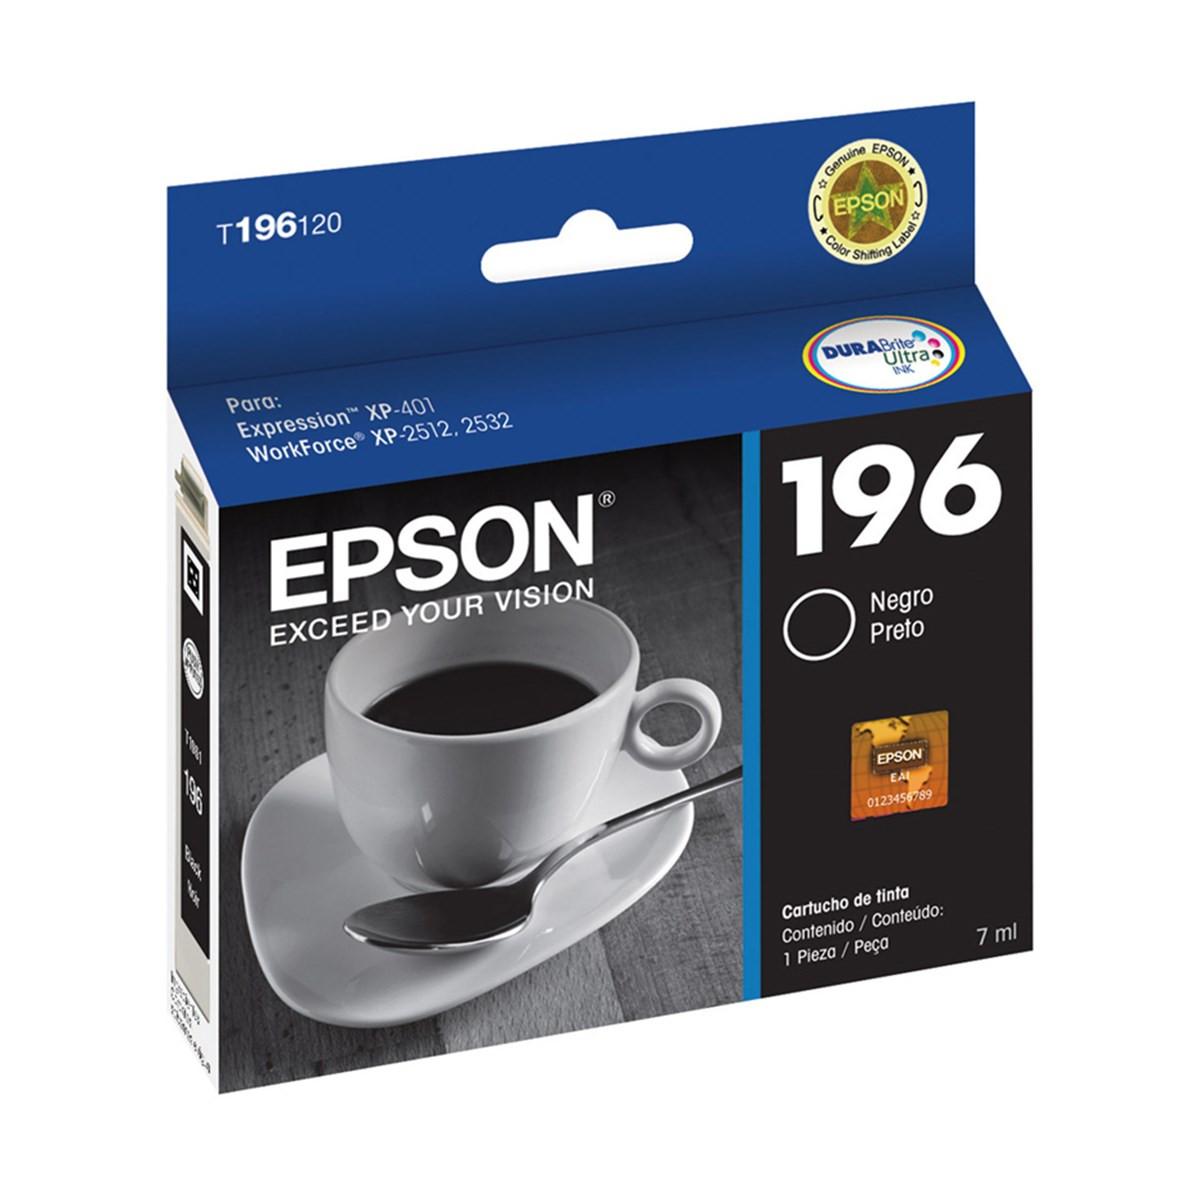 Cartucho de Tinta Epson T196120 T196 Preto | XP401 XP411 WF-2532 | Original 5ml